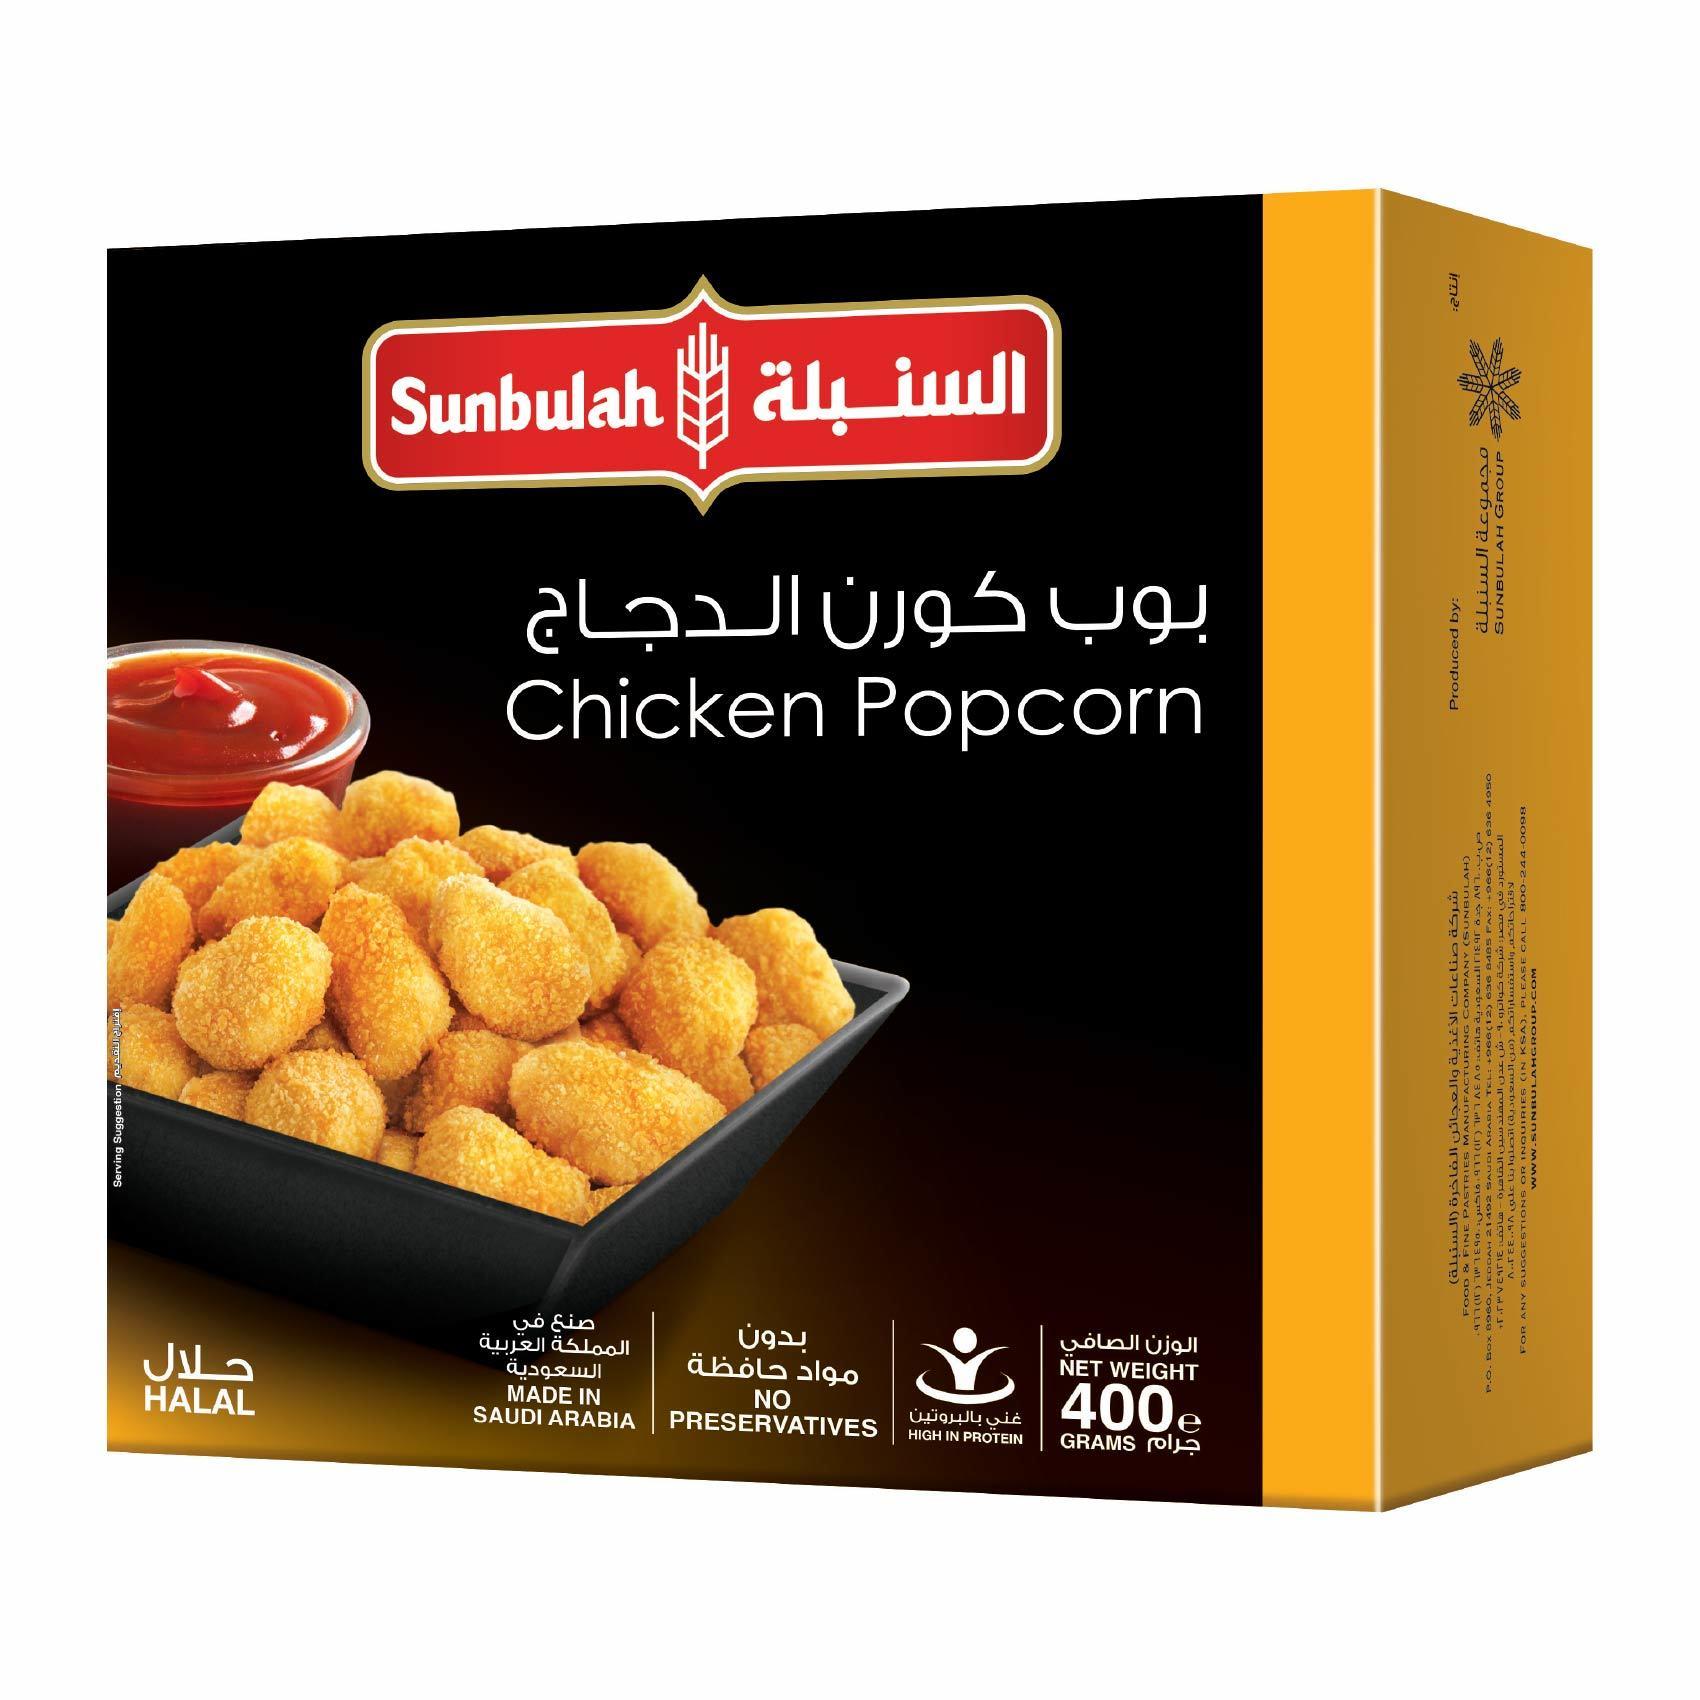 Buy Sunbulah Chicken Popcorn 400 G Online Shop Frozen Food On Carrefour Saudi Arabia